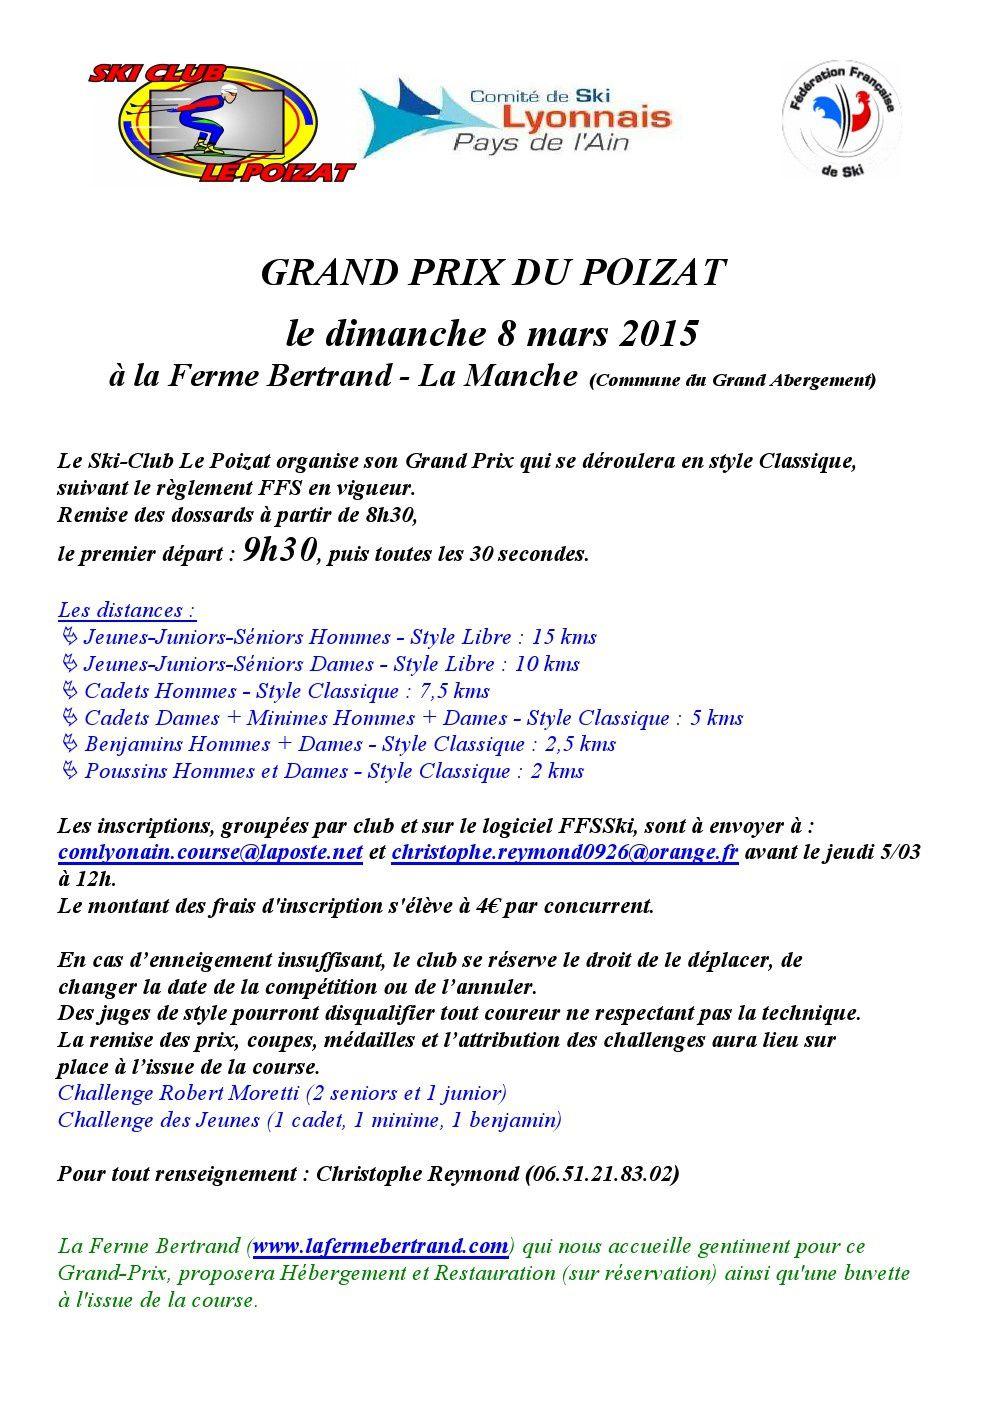 Grand Prix du Poizat.